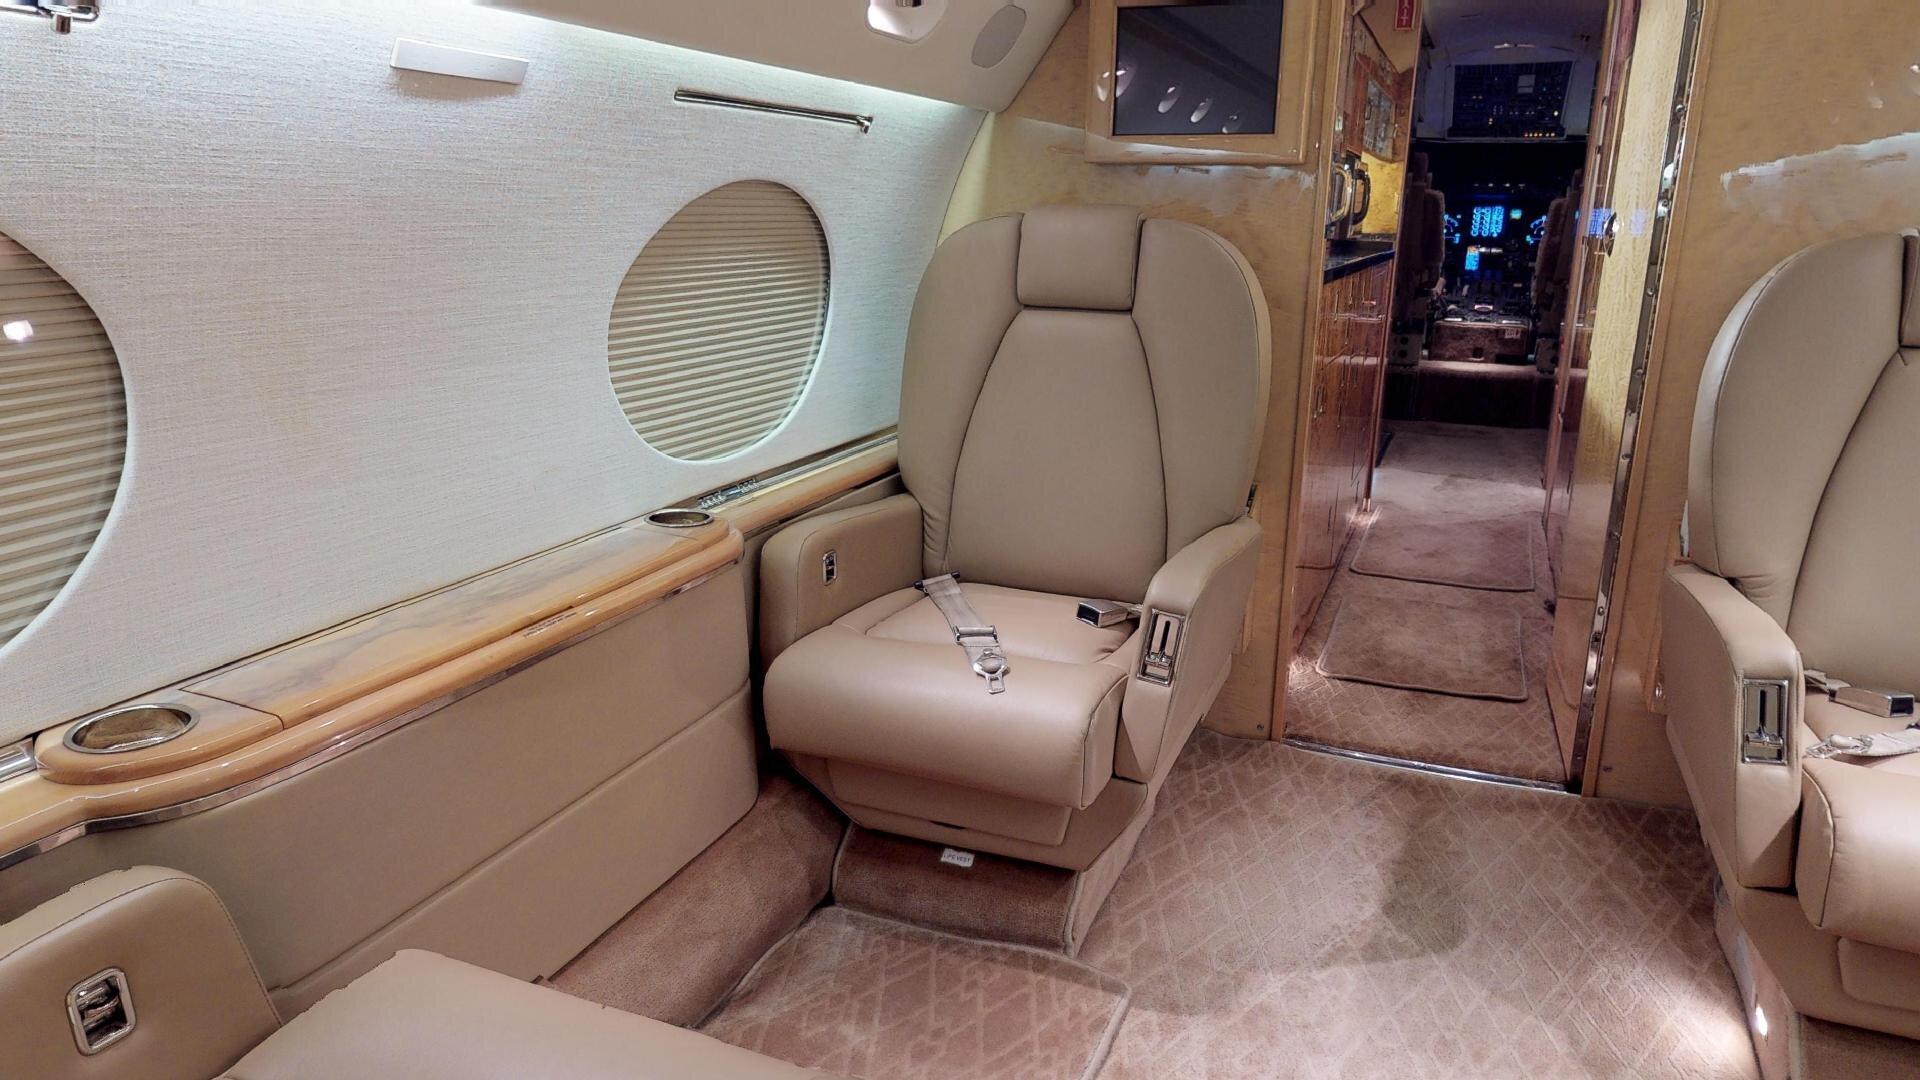 Gulfstream-V-SN-518-09232019_132153.jpg